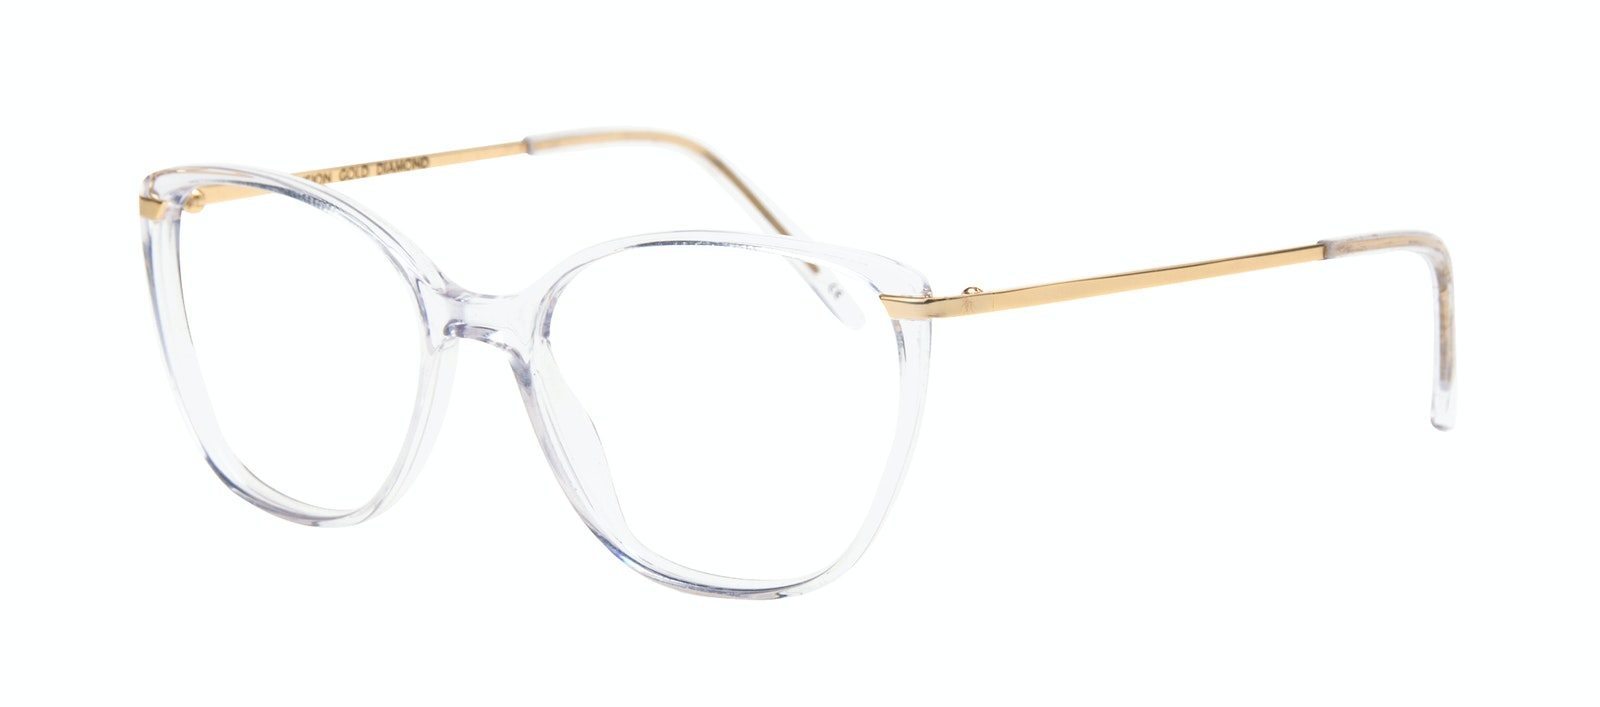 Affordable Fashion Glasses Rectangle Square Eyeglasses Women Illusion Gold Diamond Tilt